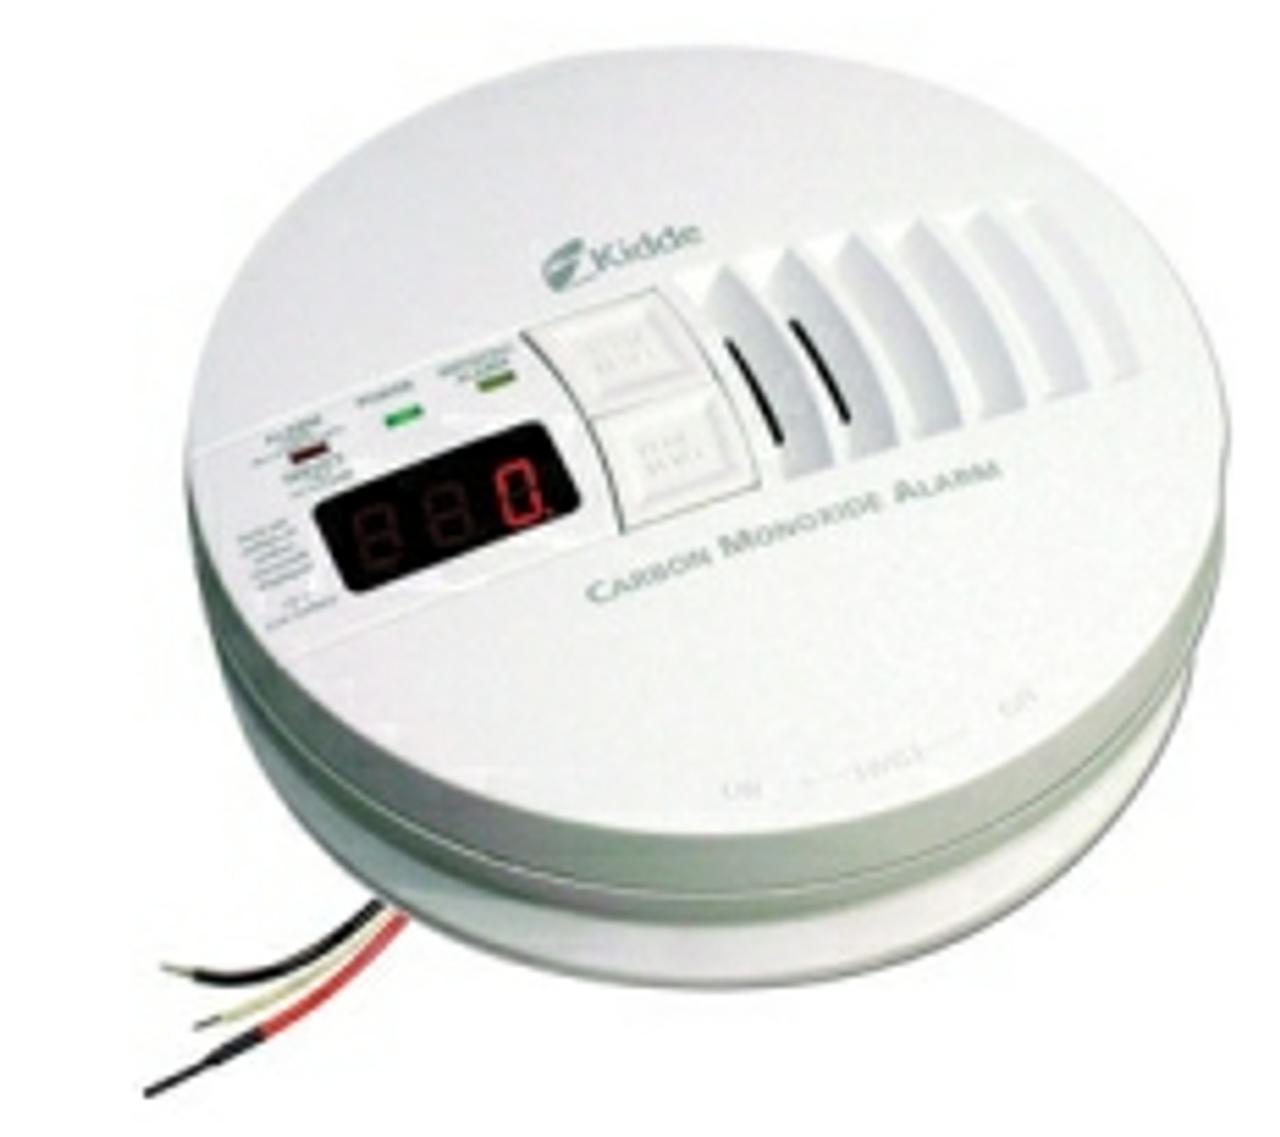 Kidde 21006407 -AC/DC Hard-Wired CO Alarm w/ Digital Display